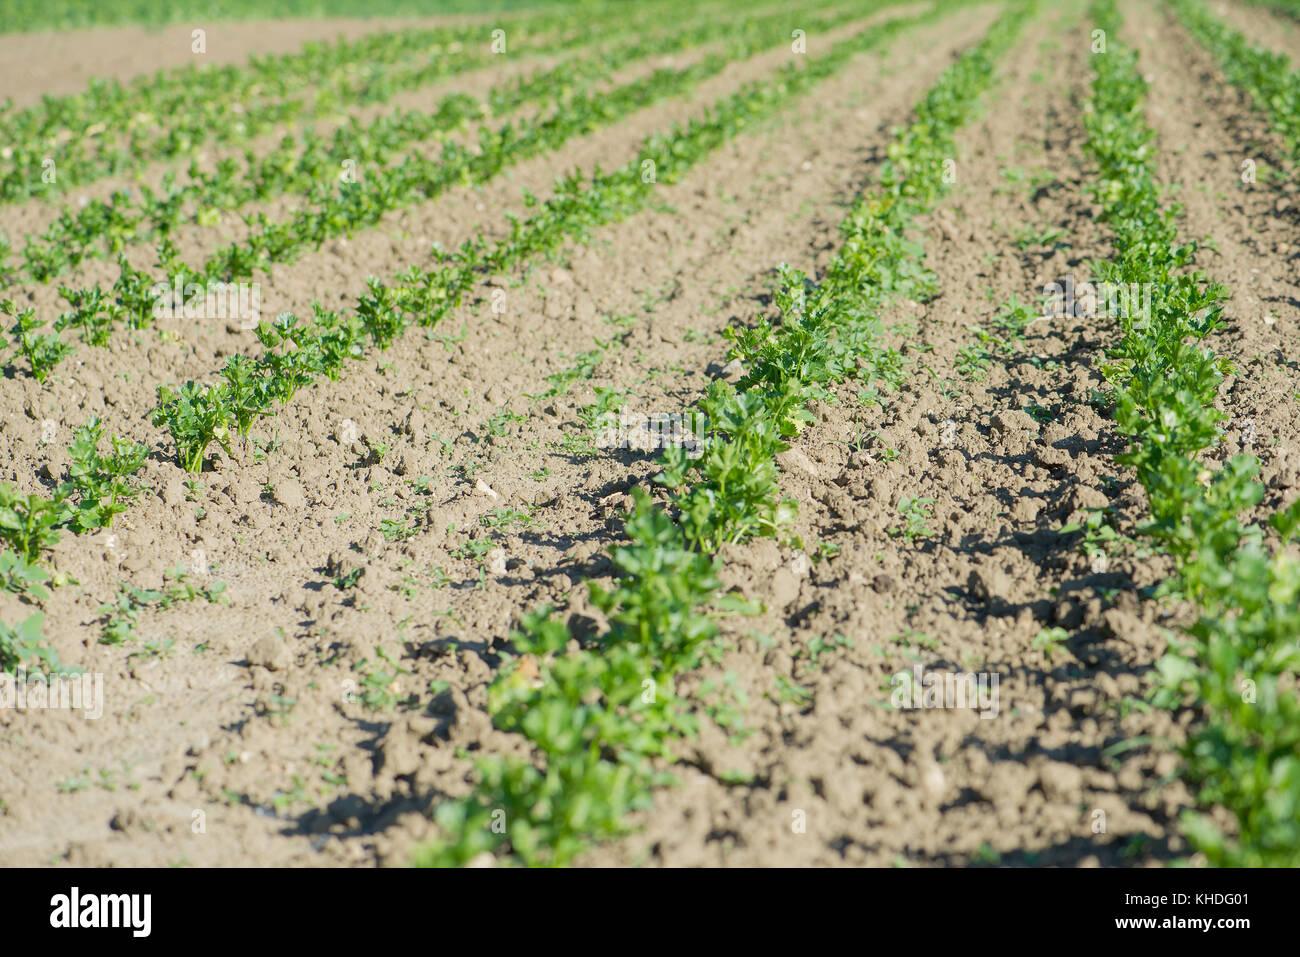 Crops growing in field Stock Photo